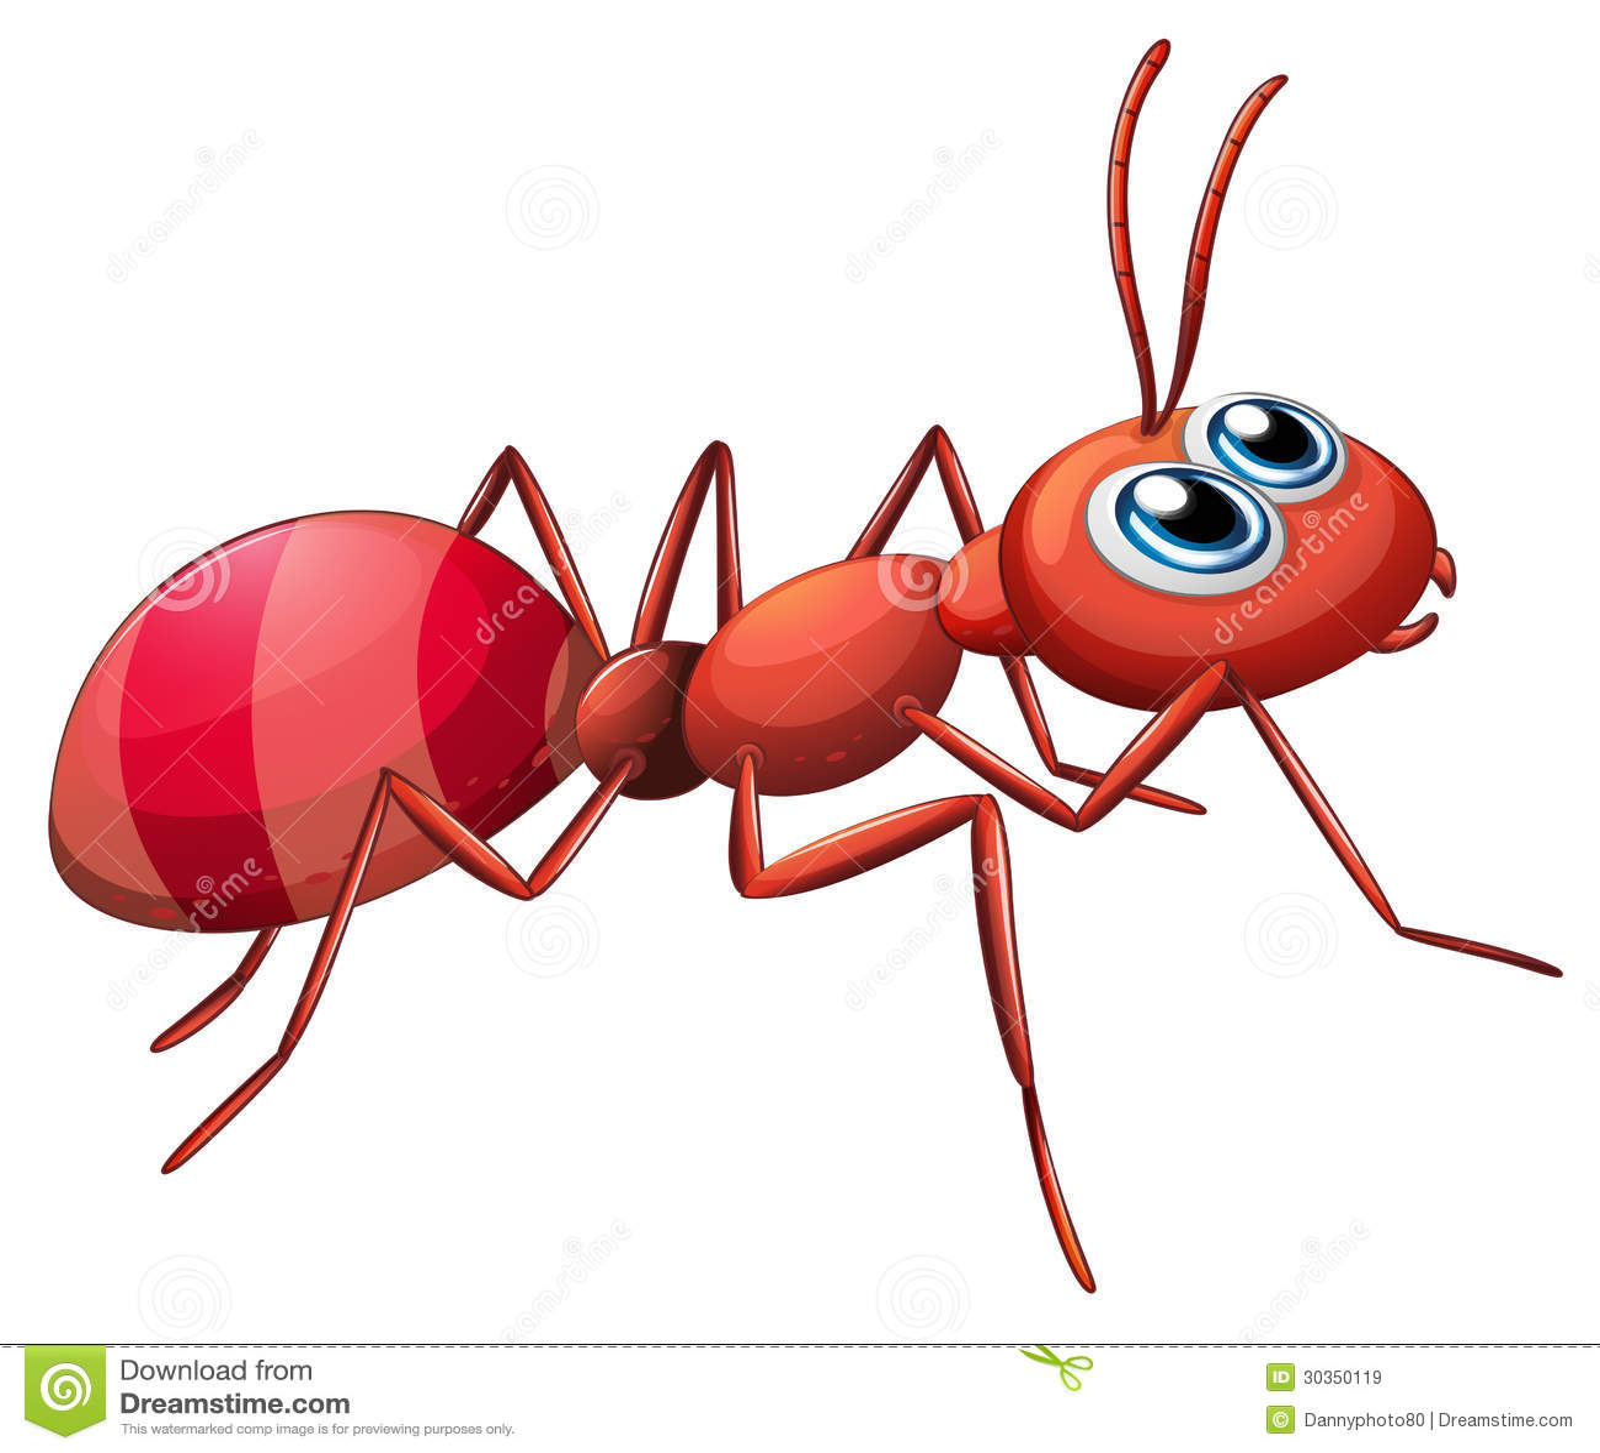 cartoon ants crawling